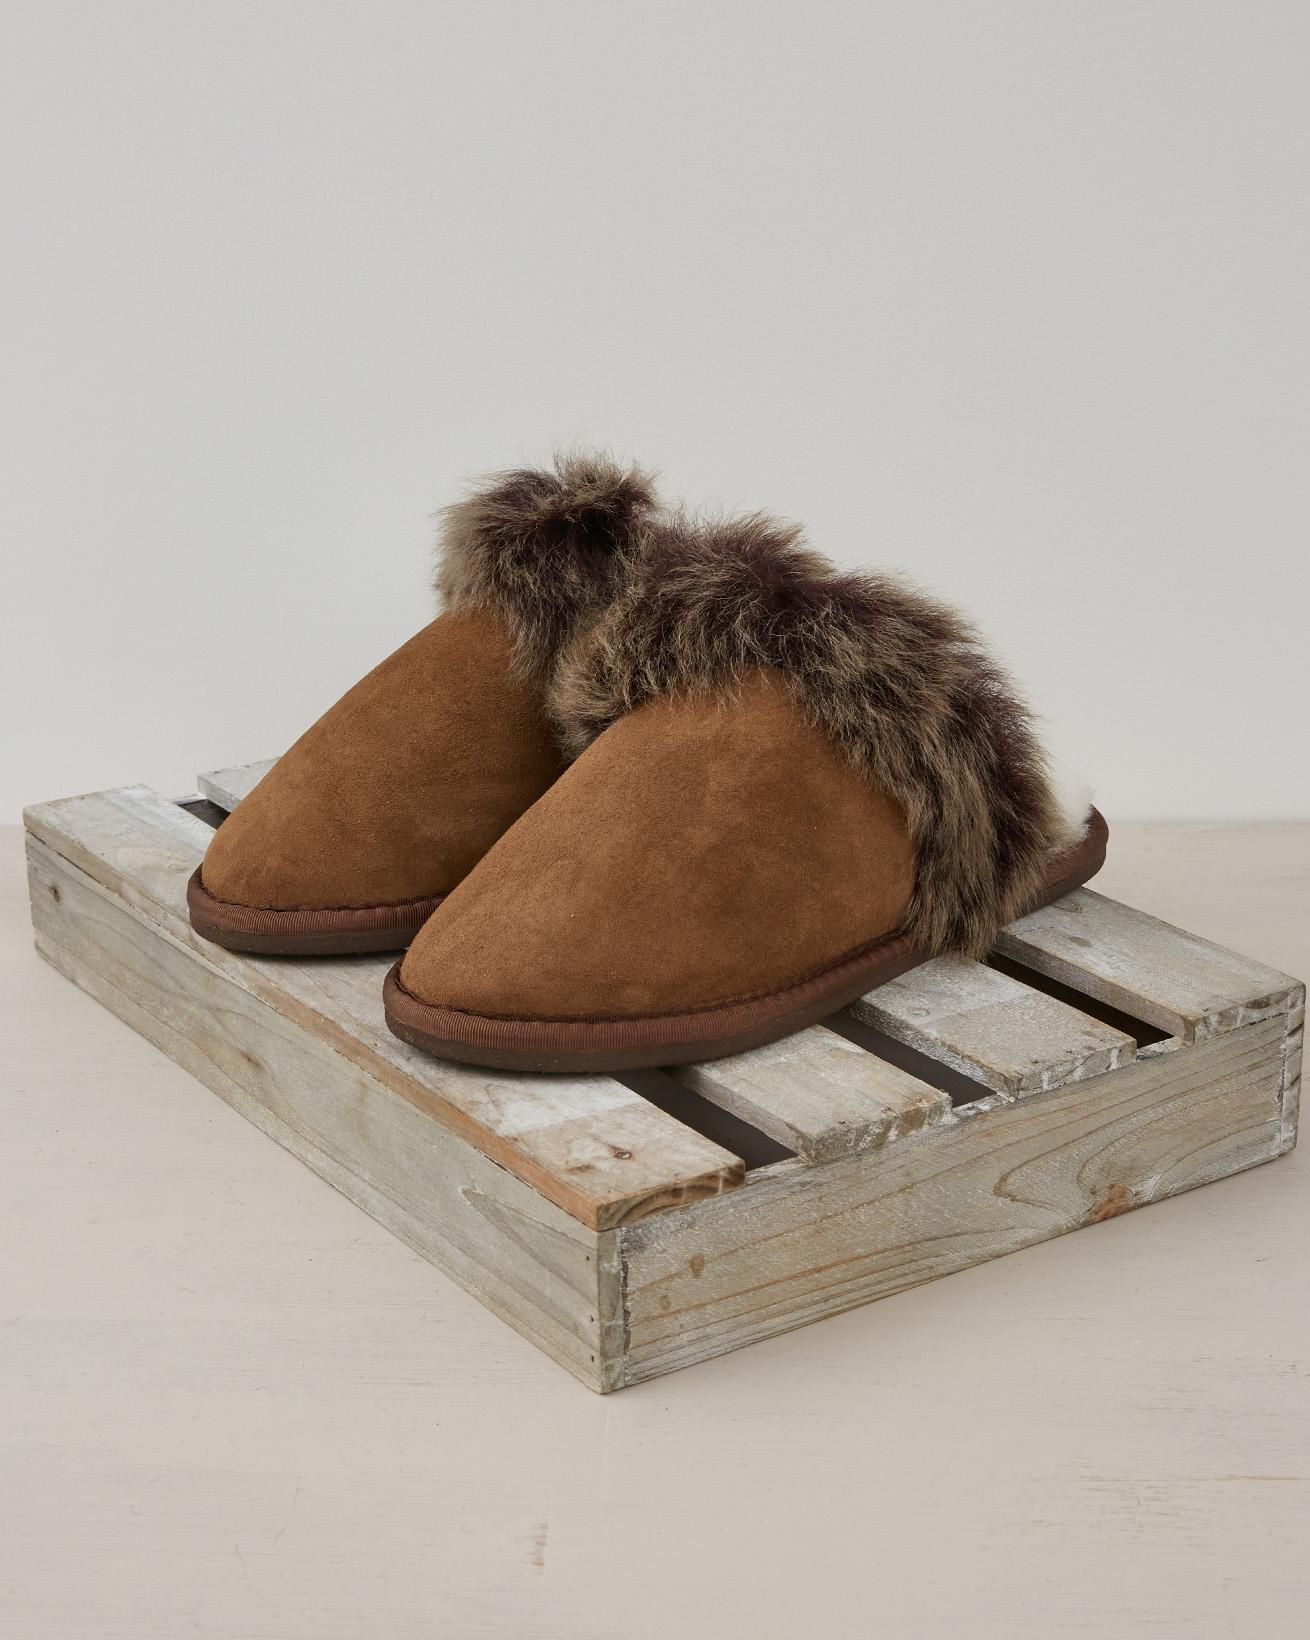 Toscana Mule Slippers - Size 6 -  Khaki - 2389